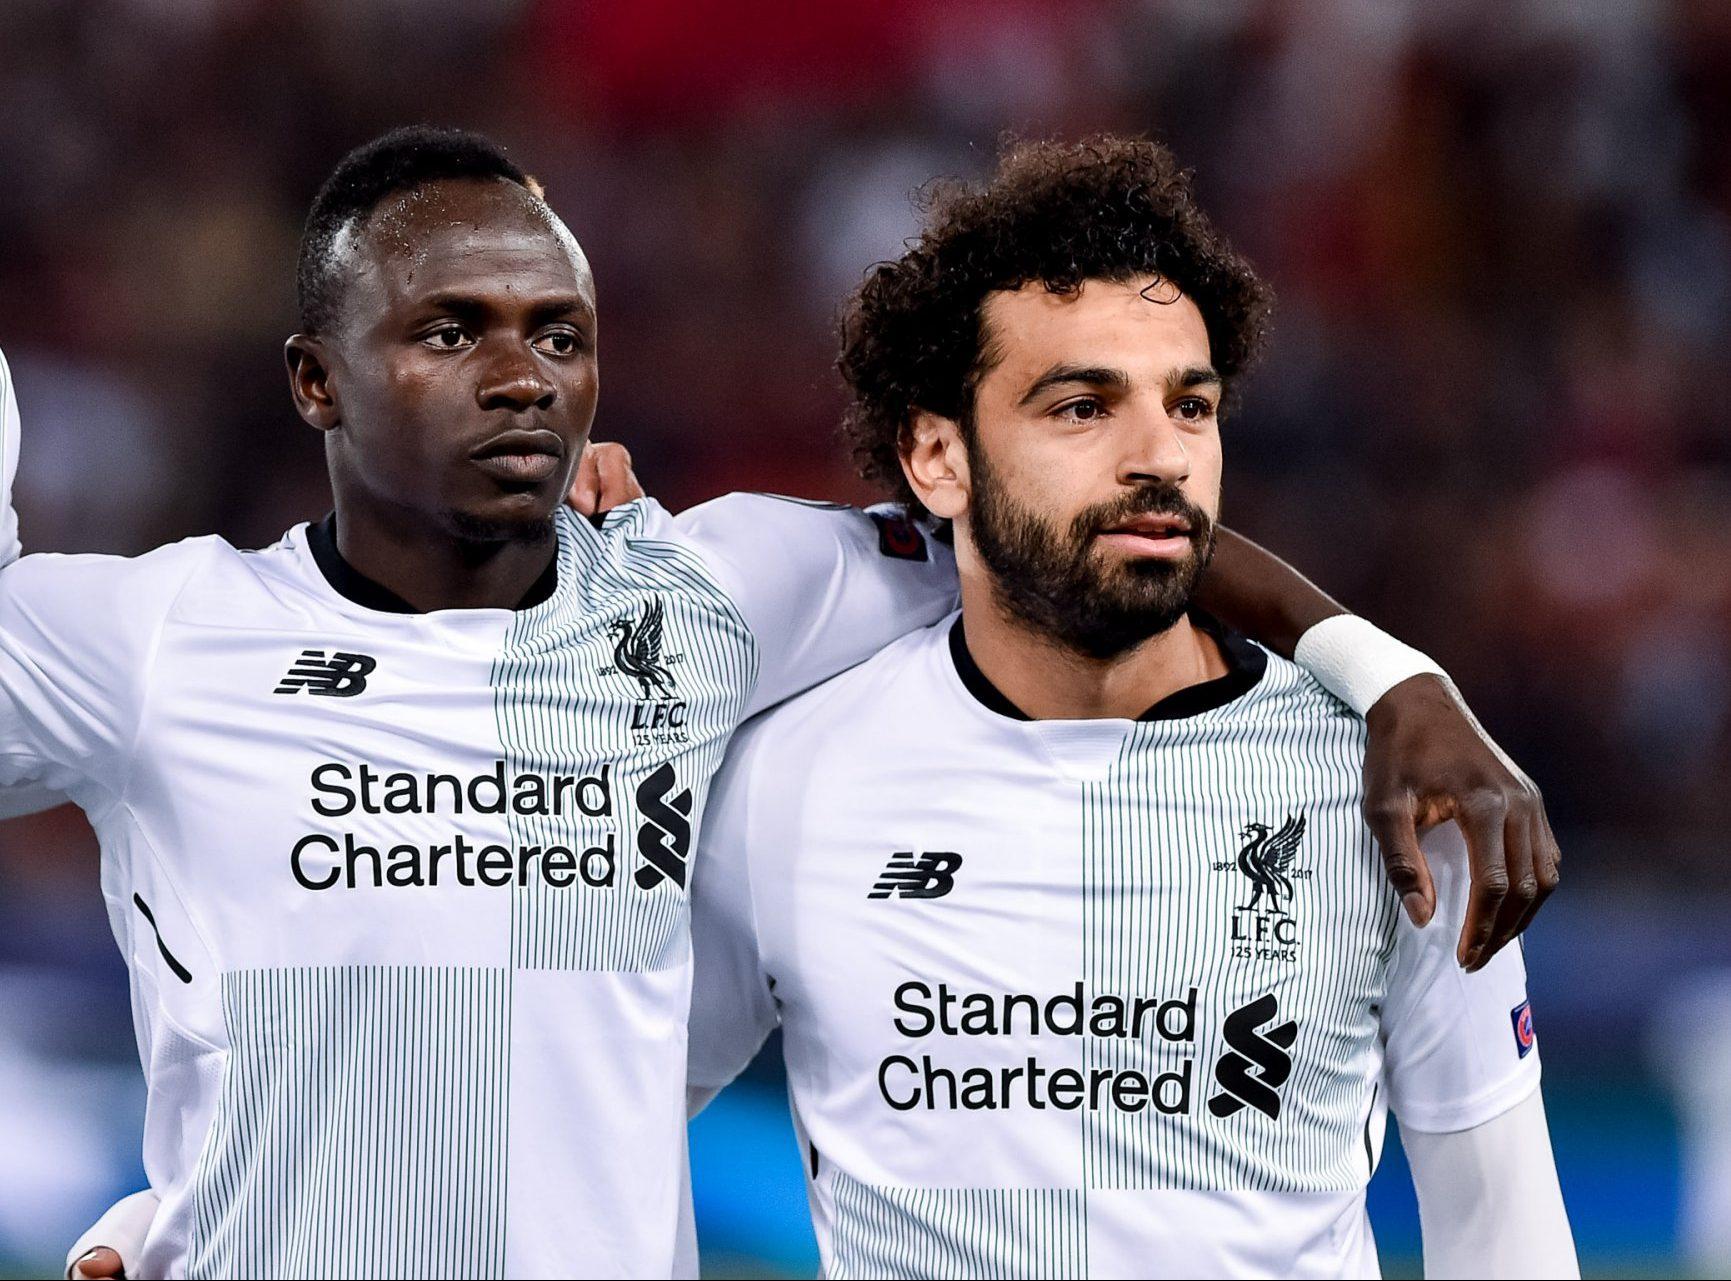 Mohamed Salah, Roberto Firmino and Sadio Mane break Champions League record held by Cristiano Ronaldo, Gareth Bale and Karim Benzema